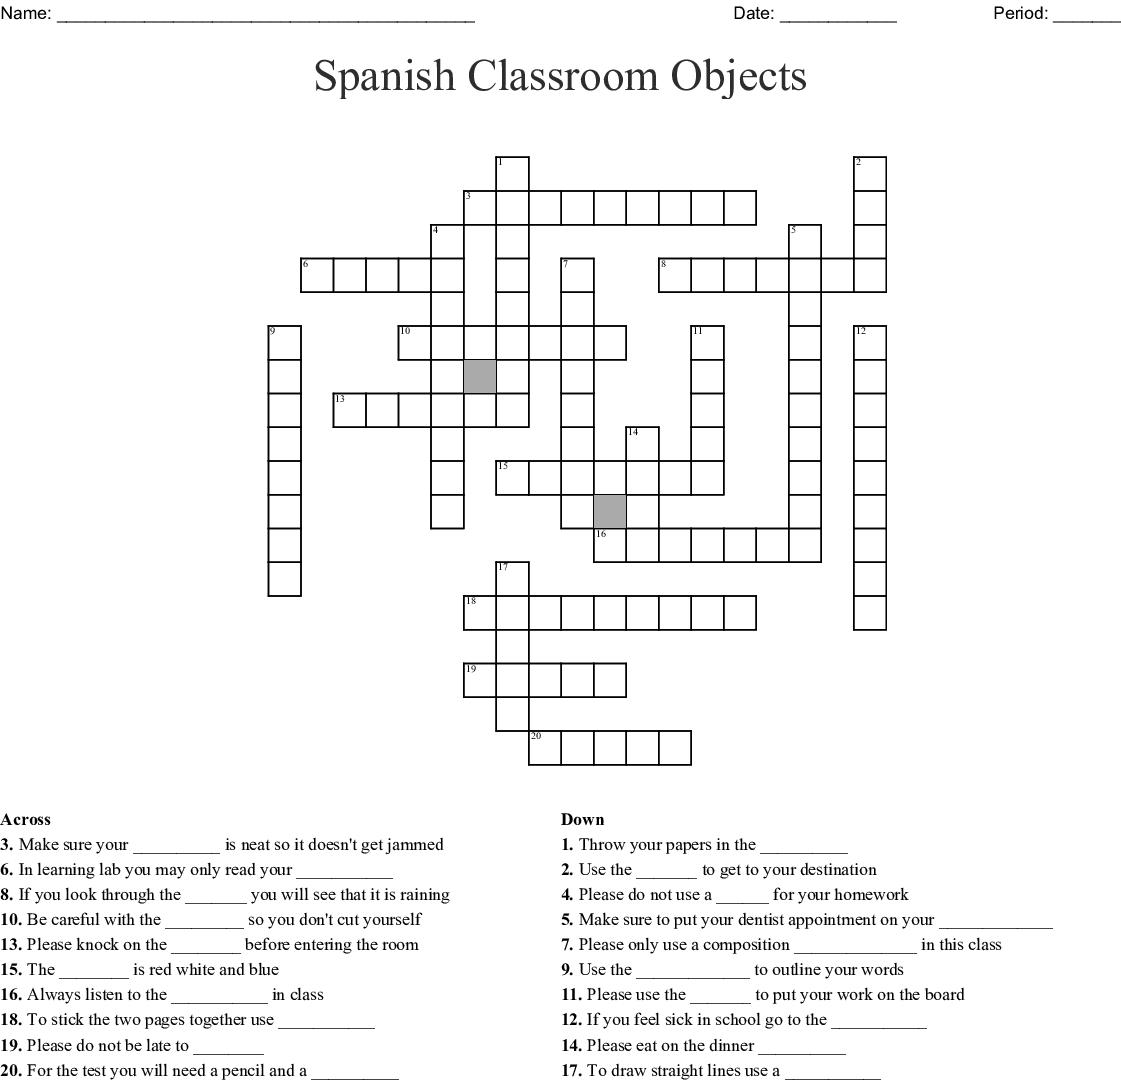 Spanish Classroom Objects Crossword